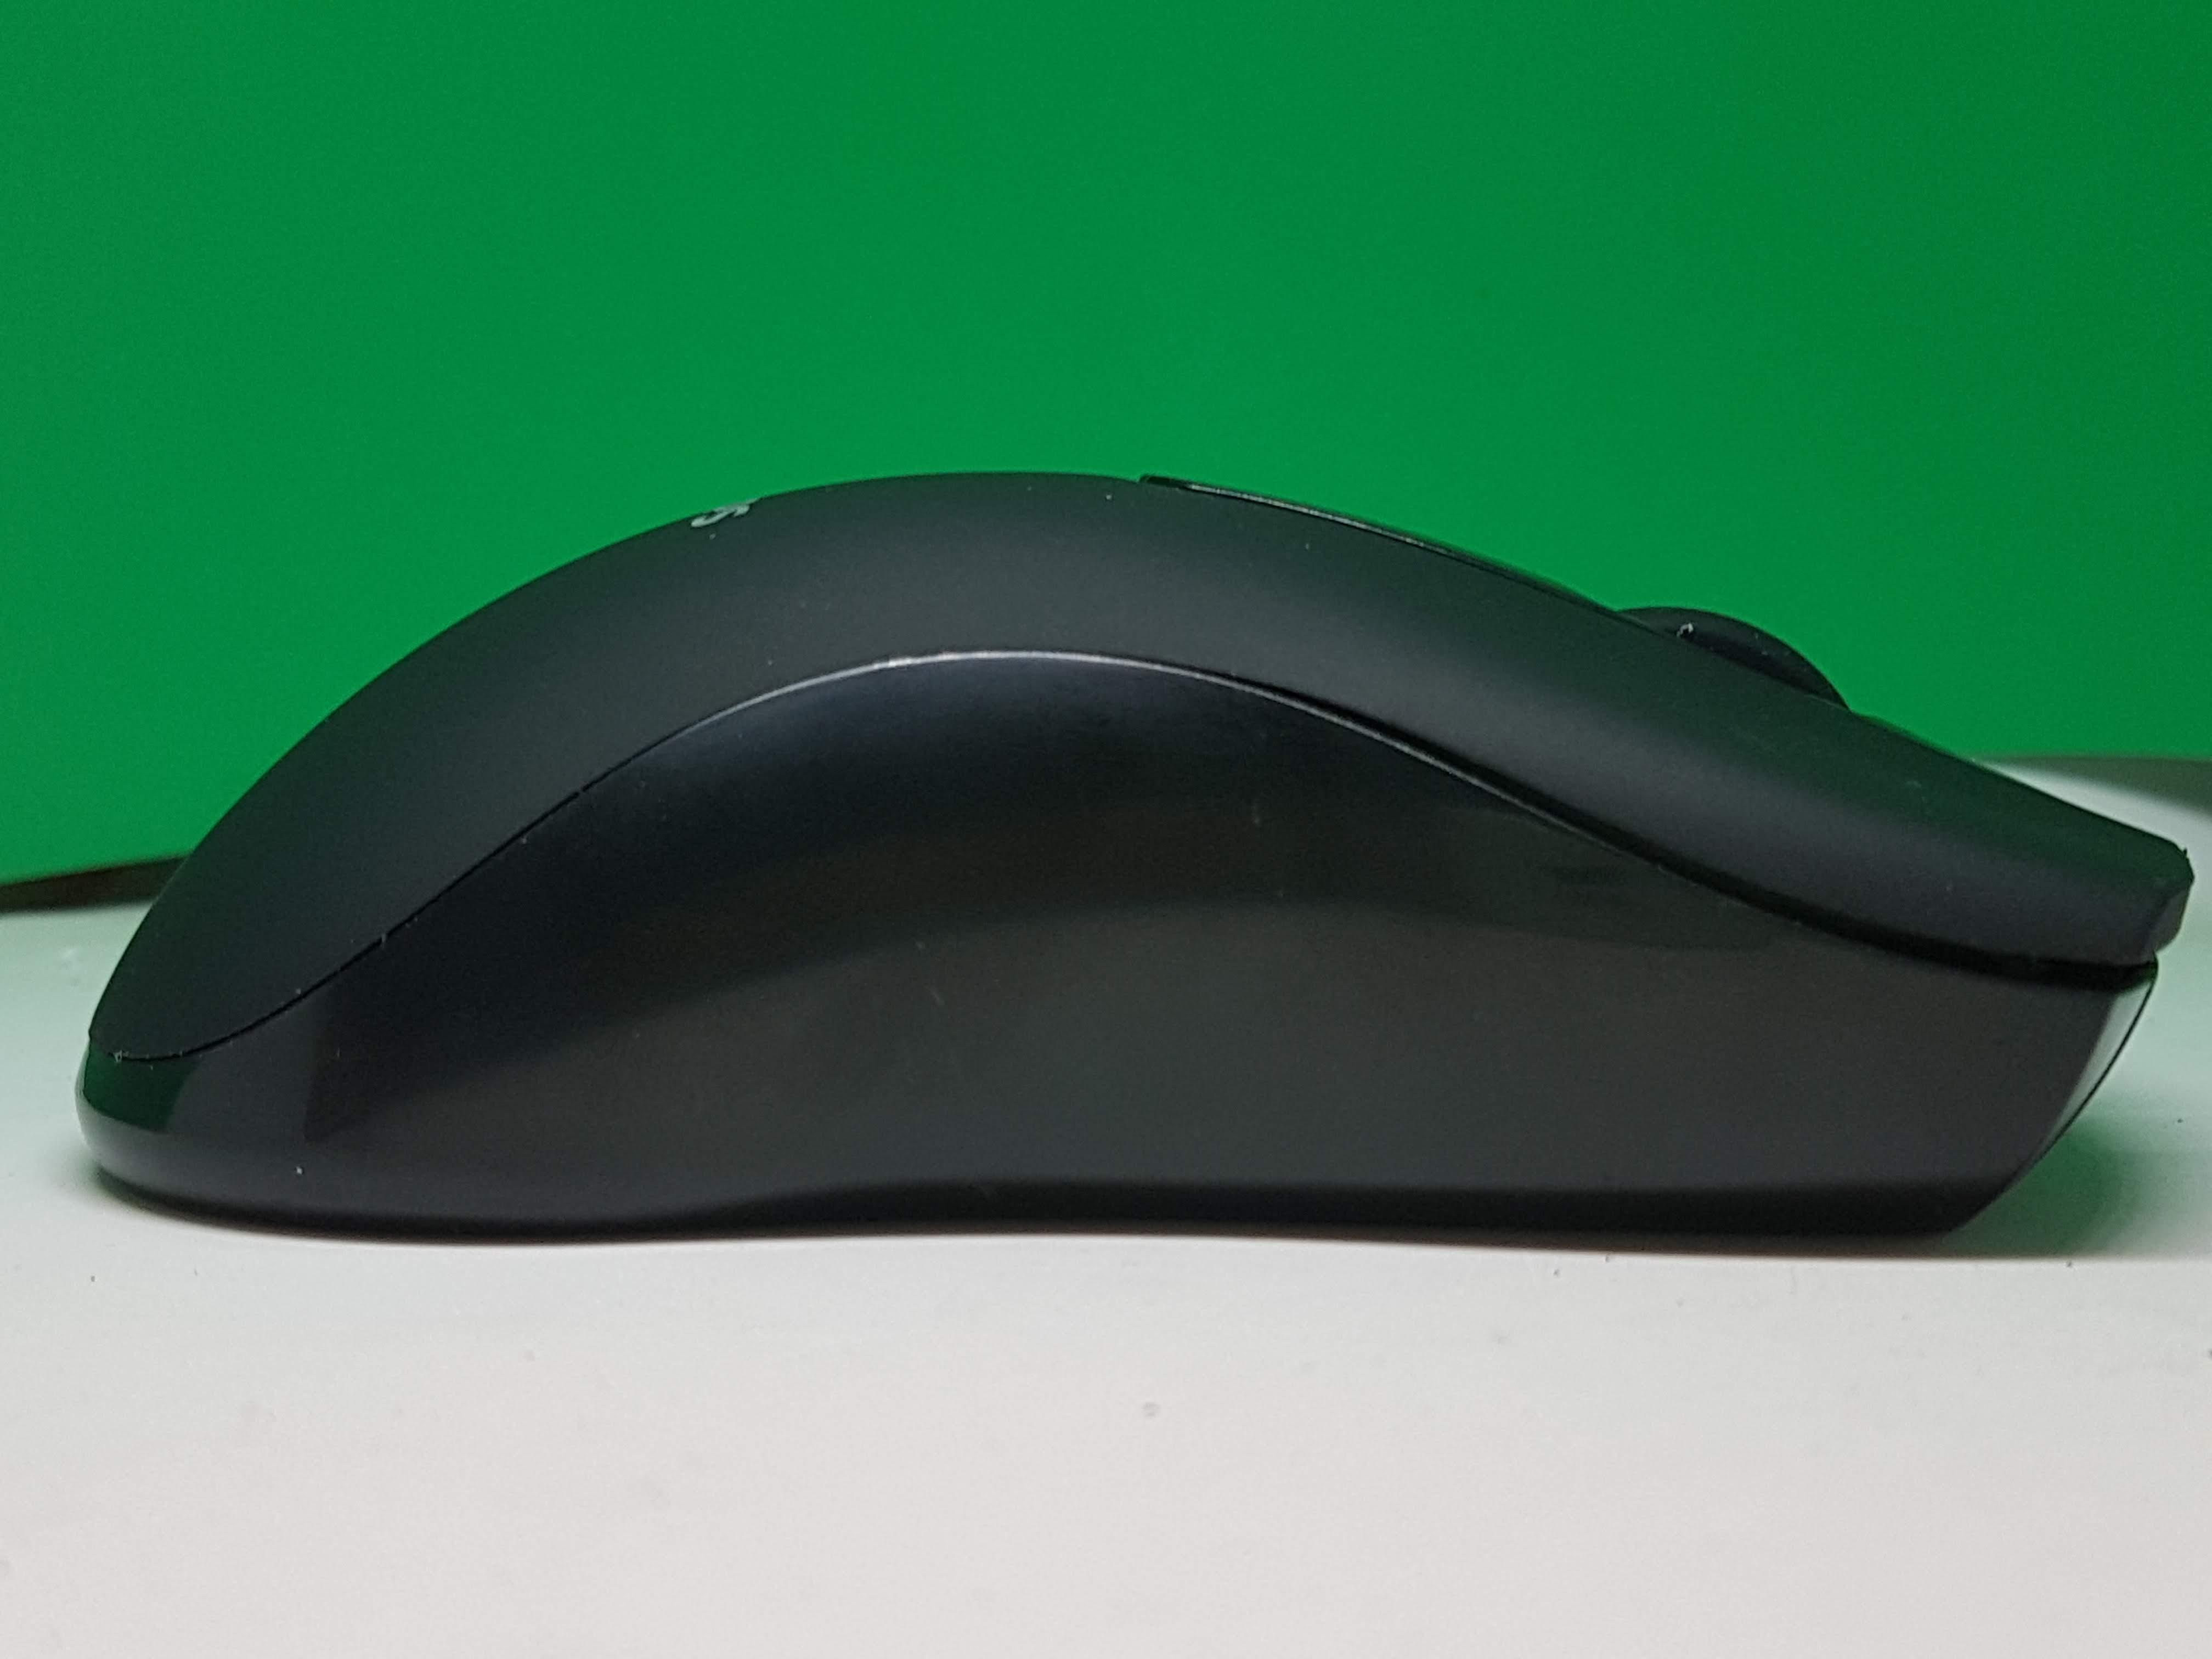 Philips-Souris-M200 - Souris-Philips-M200-13.jpg